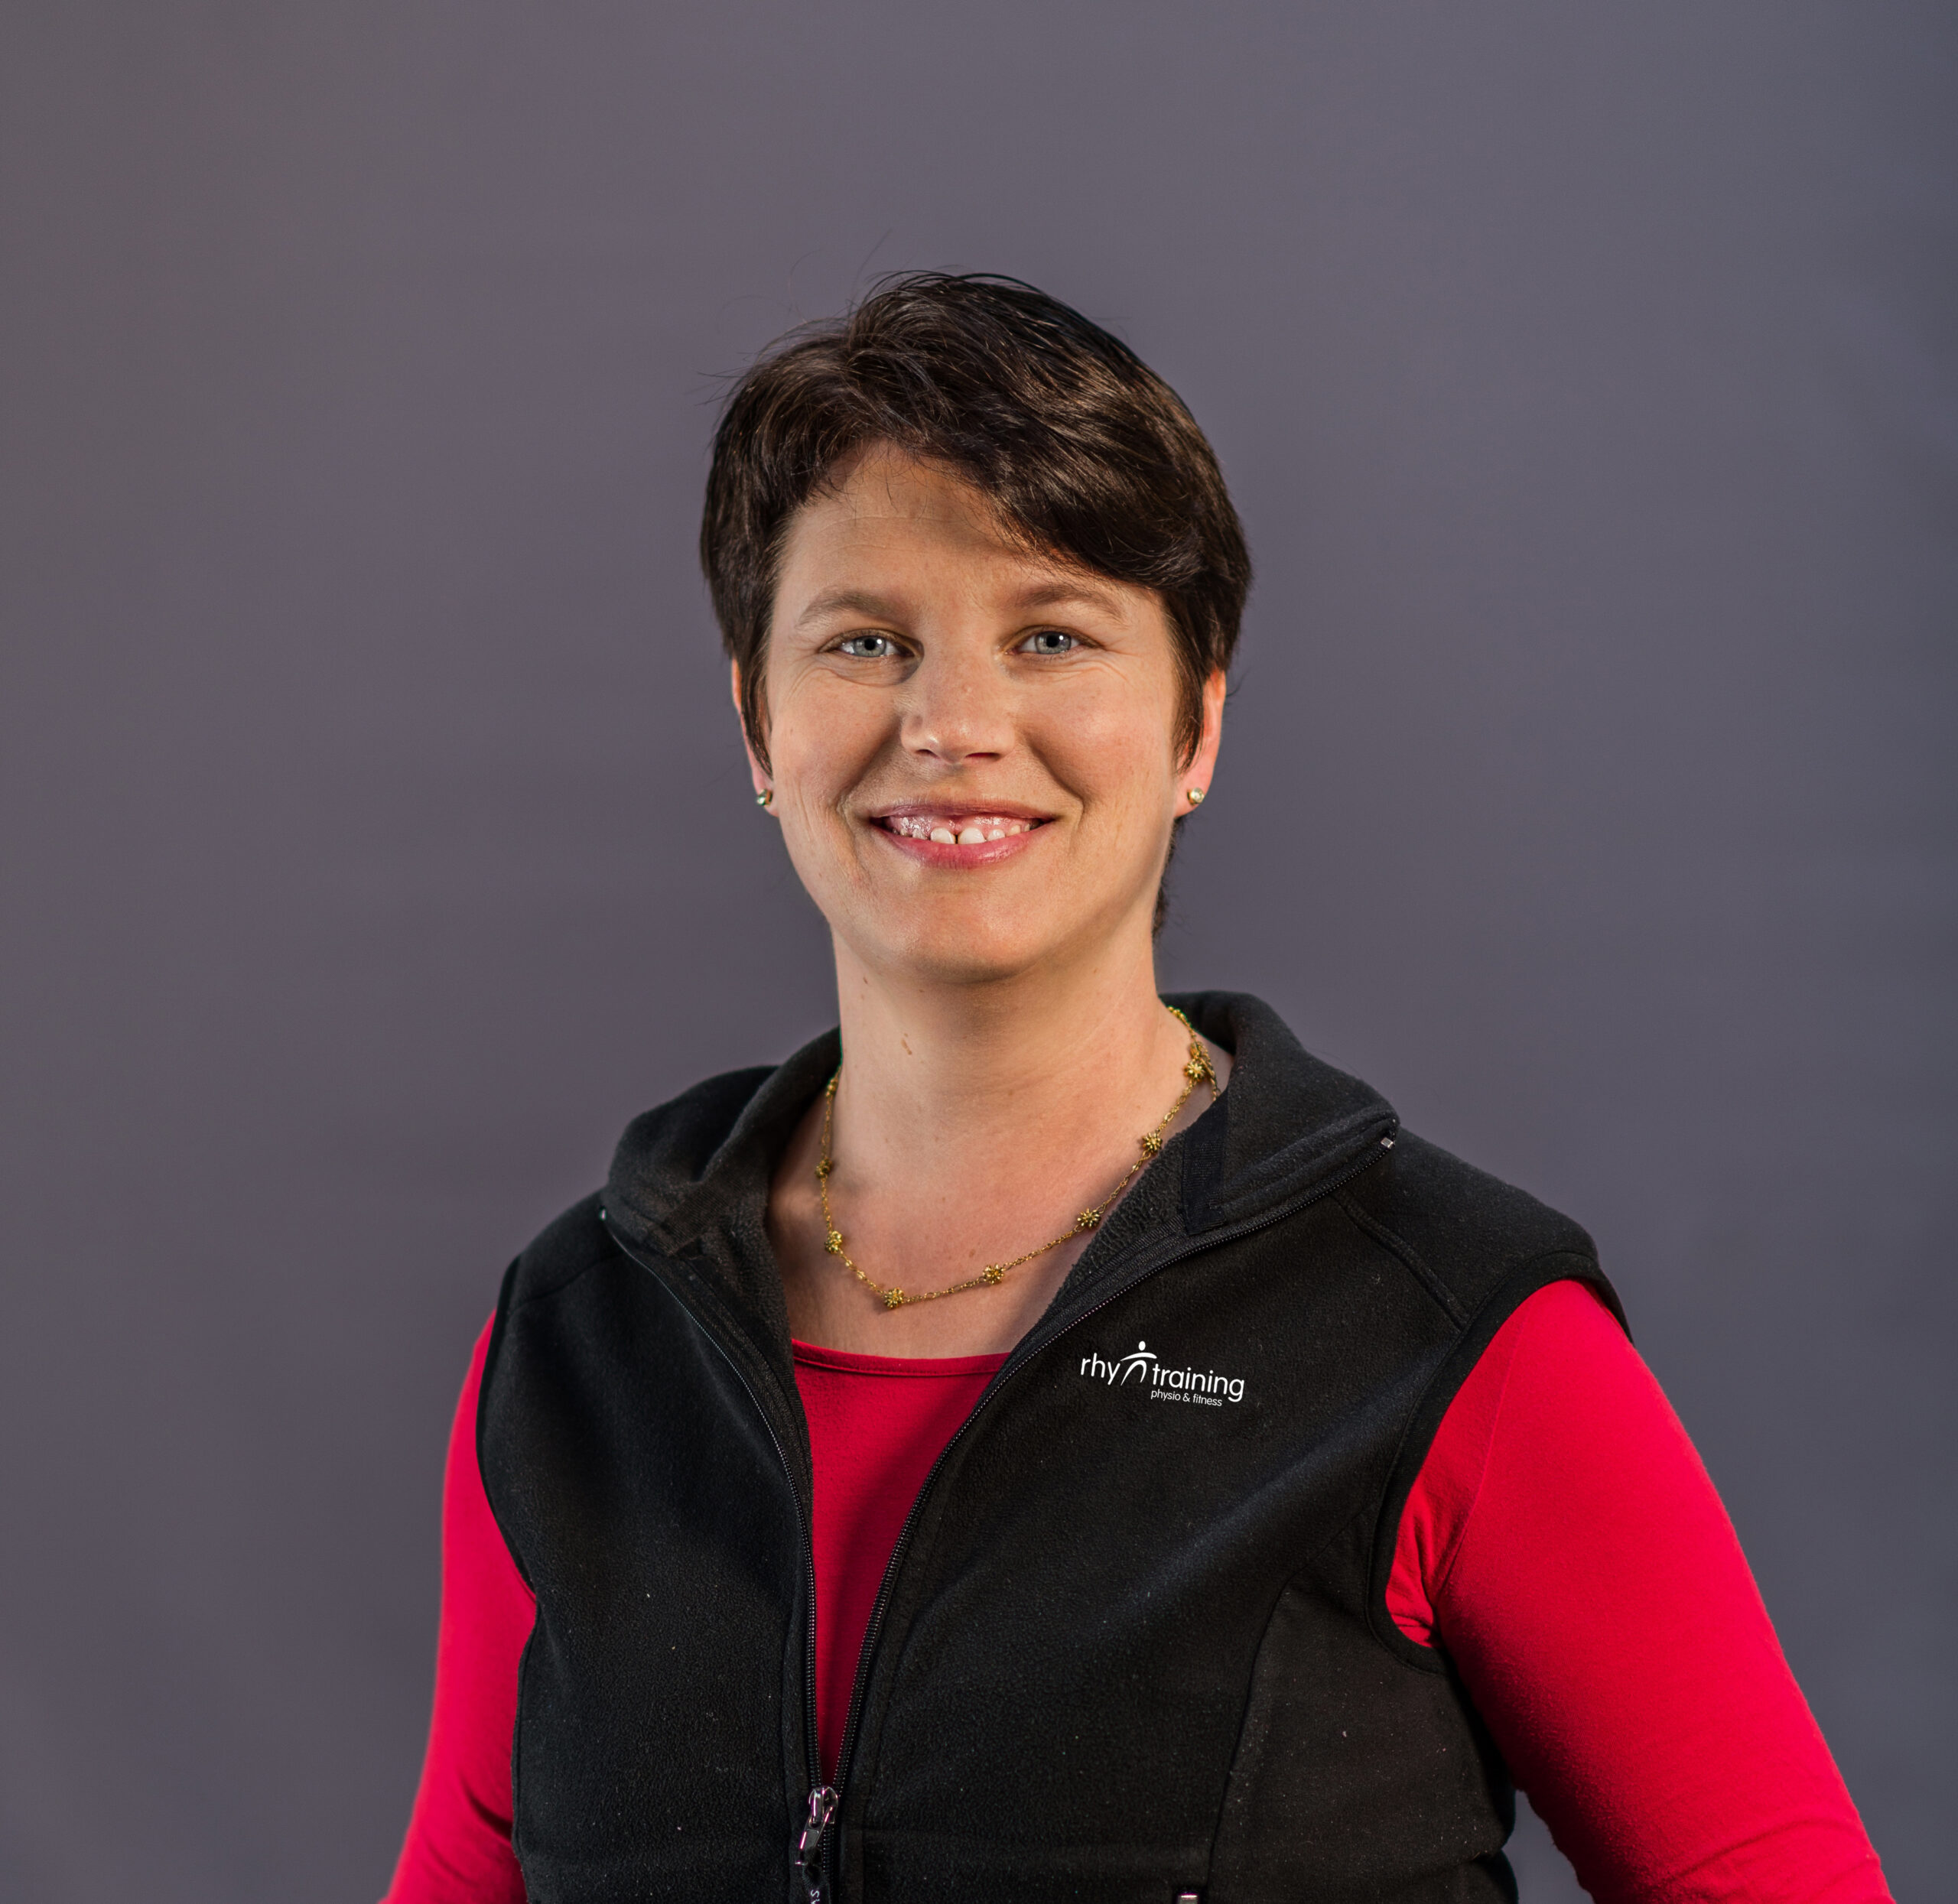 rhytraining – physio & fitness stein am rhein | Irene Schmid